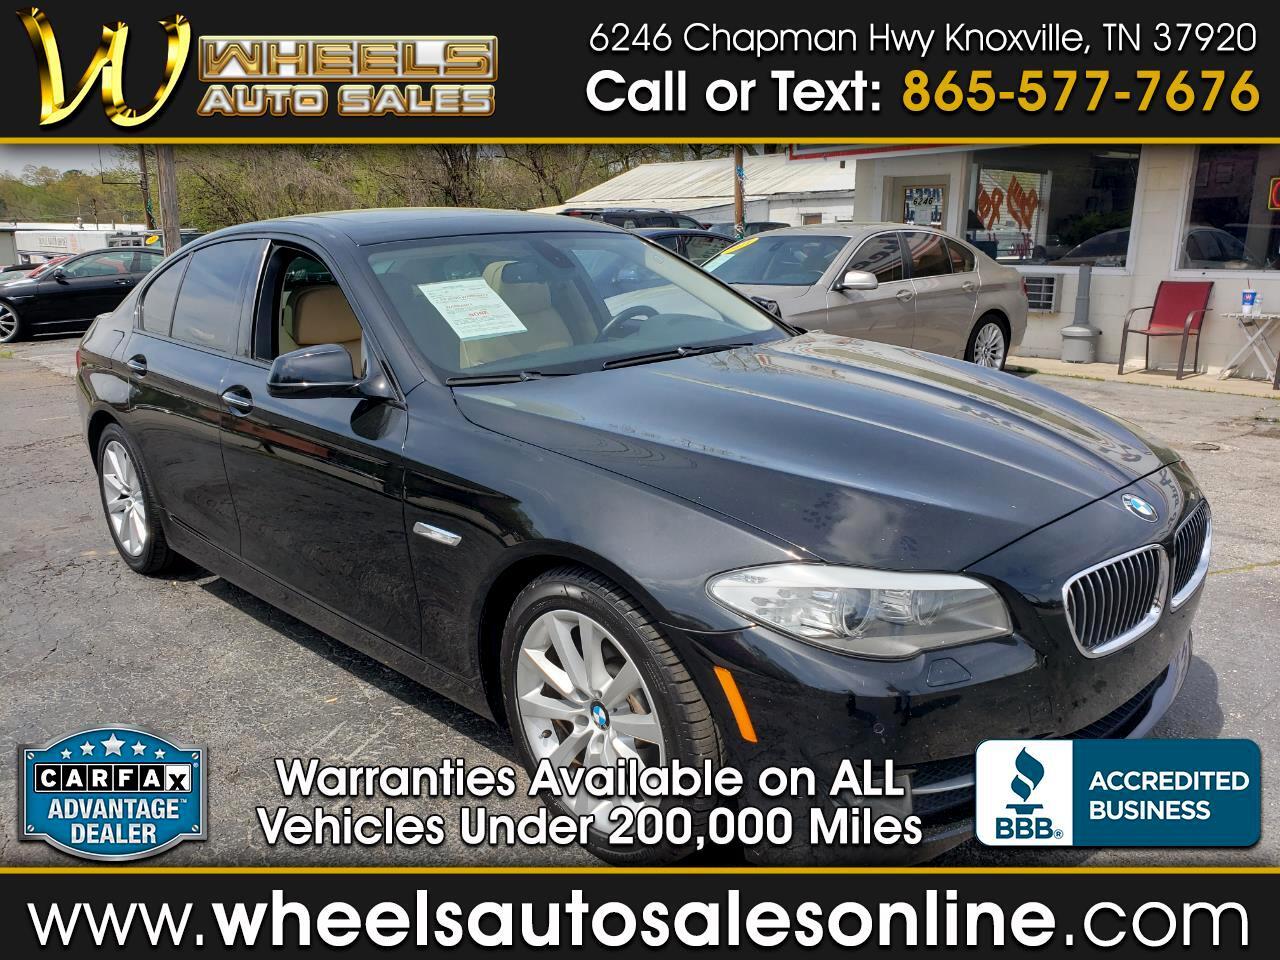 2011 BMW 5 Series 4dr Sdn 528i RWD